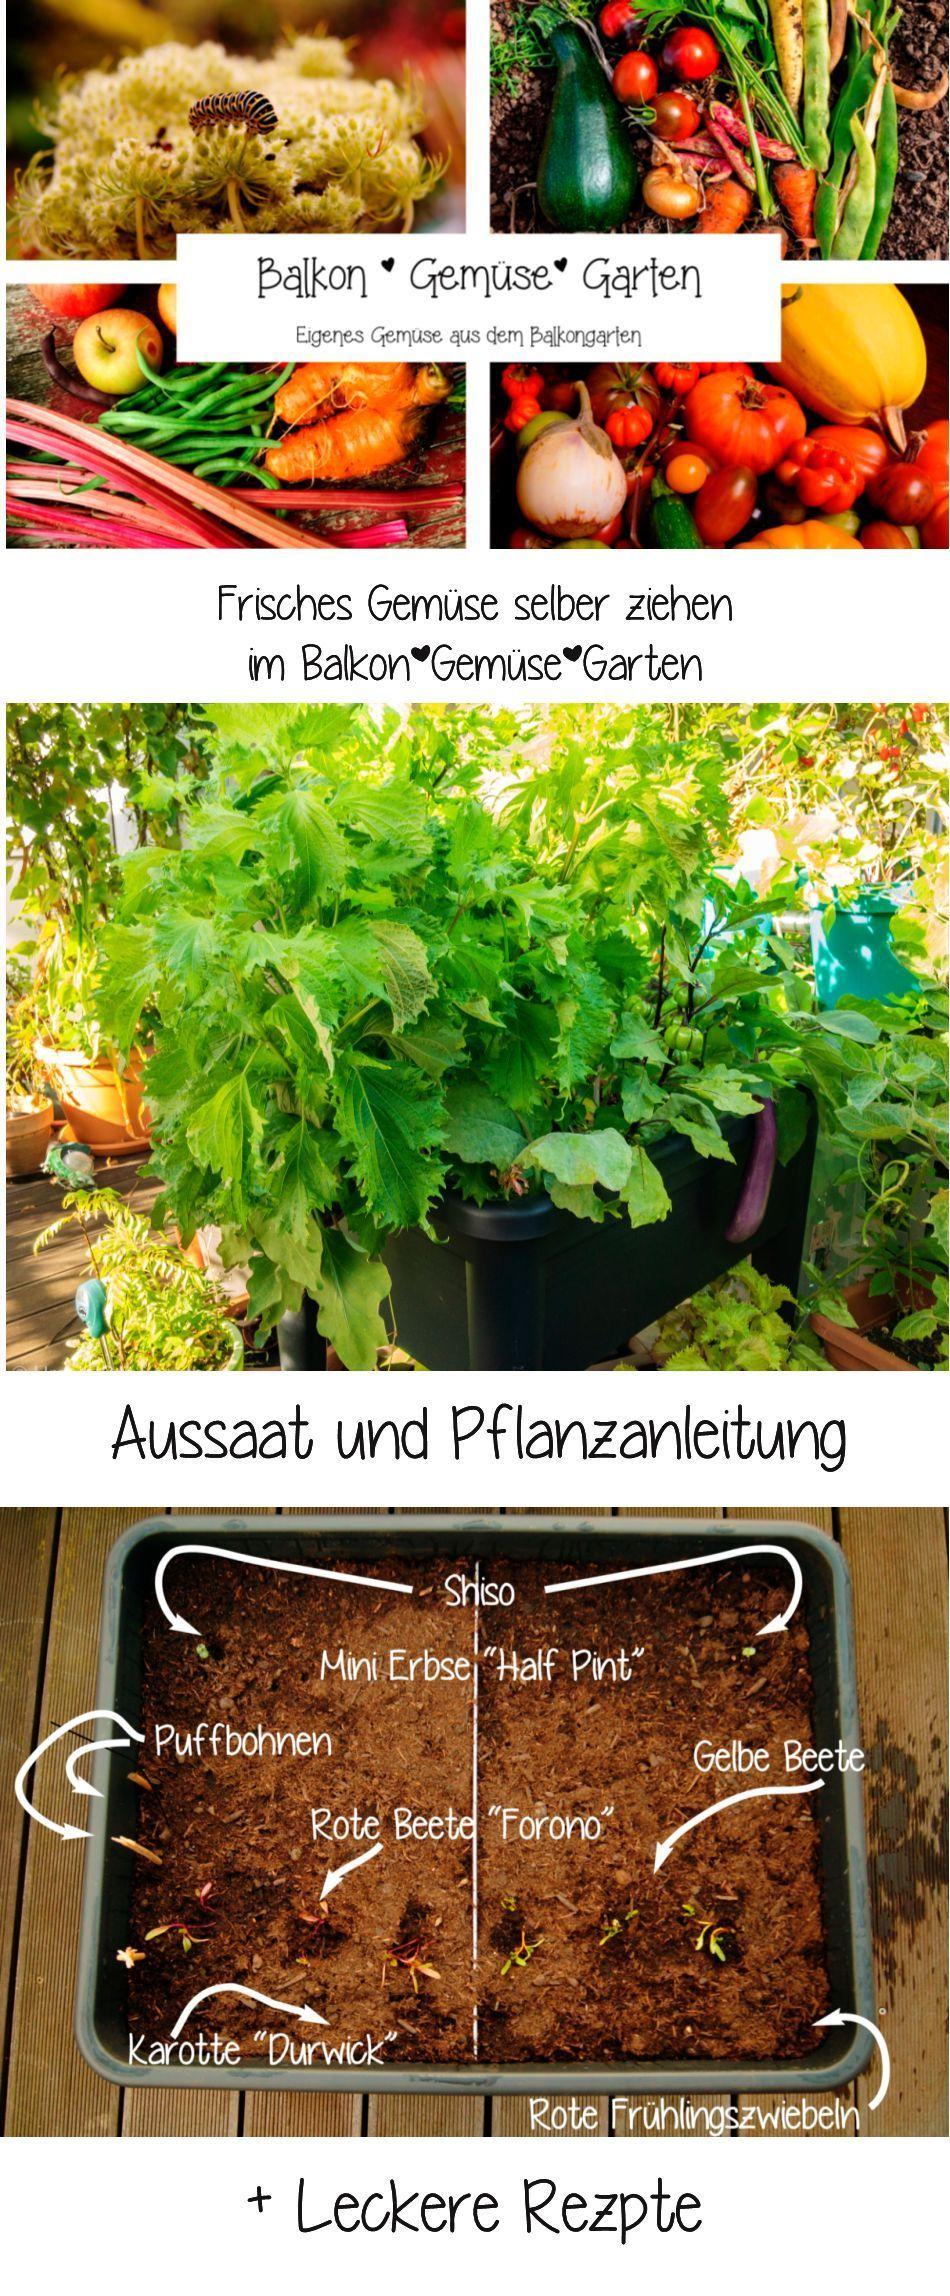 Ebook Balkon Gemuse Garten Saen Pflanzen Rezepte Anbauvongemuse Pflanzen Gemuse Anbauen Garten